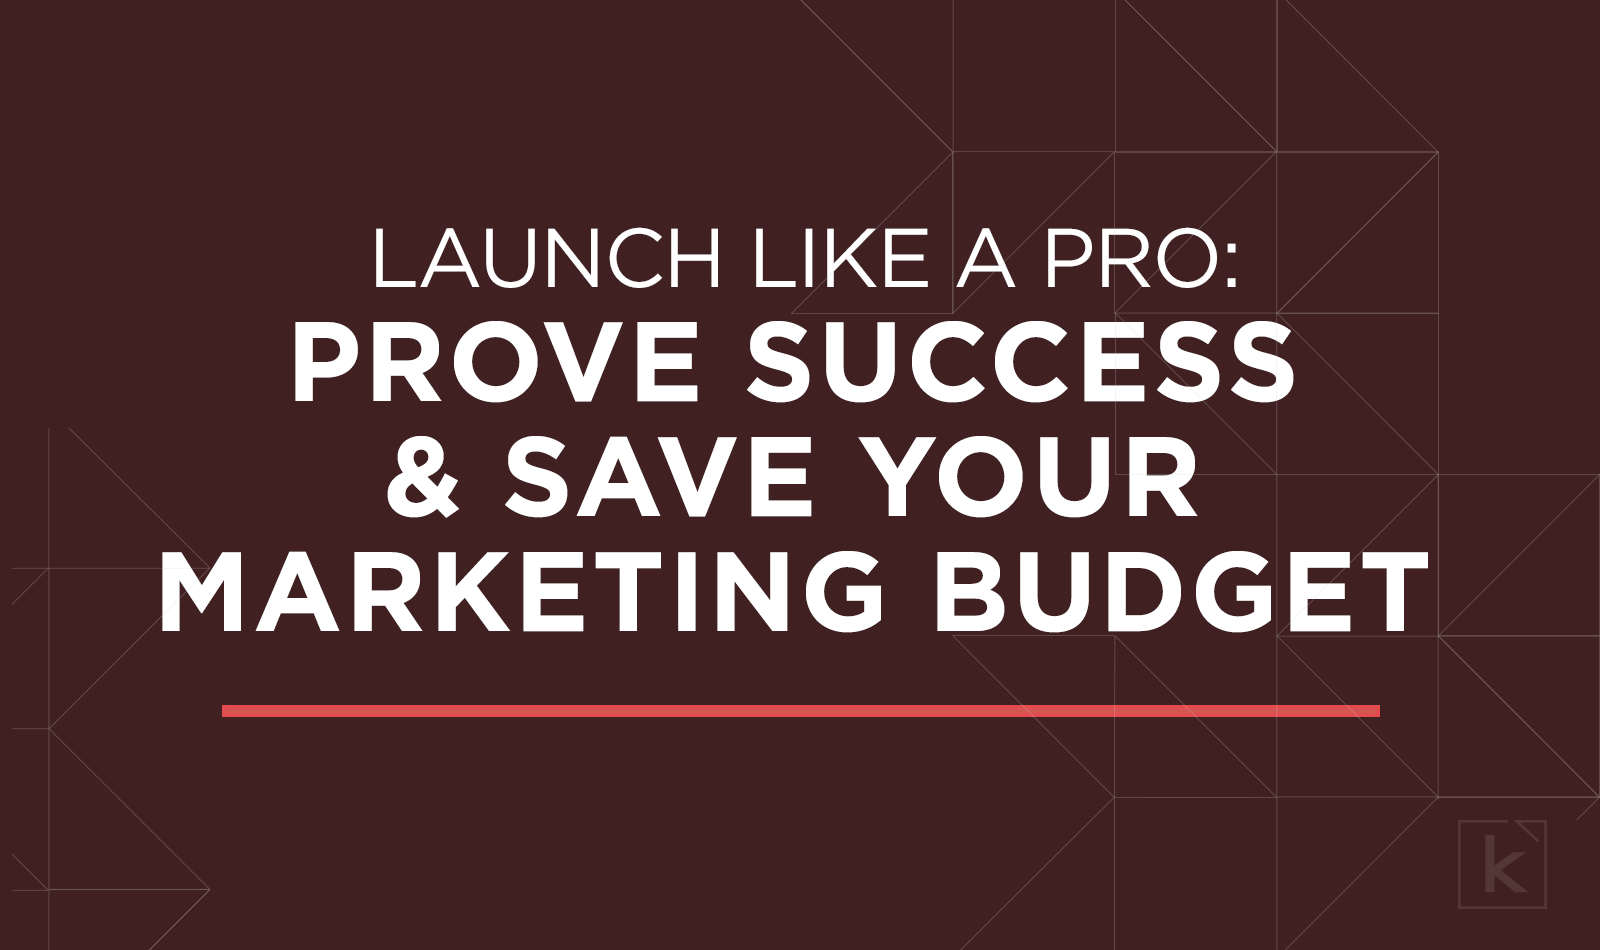 prove-success-save-marketing-budget